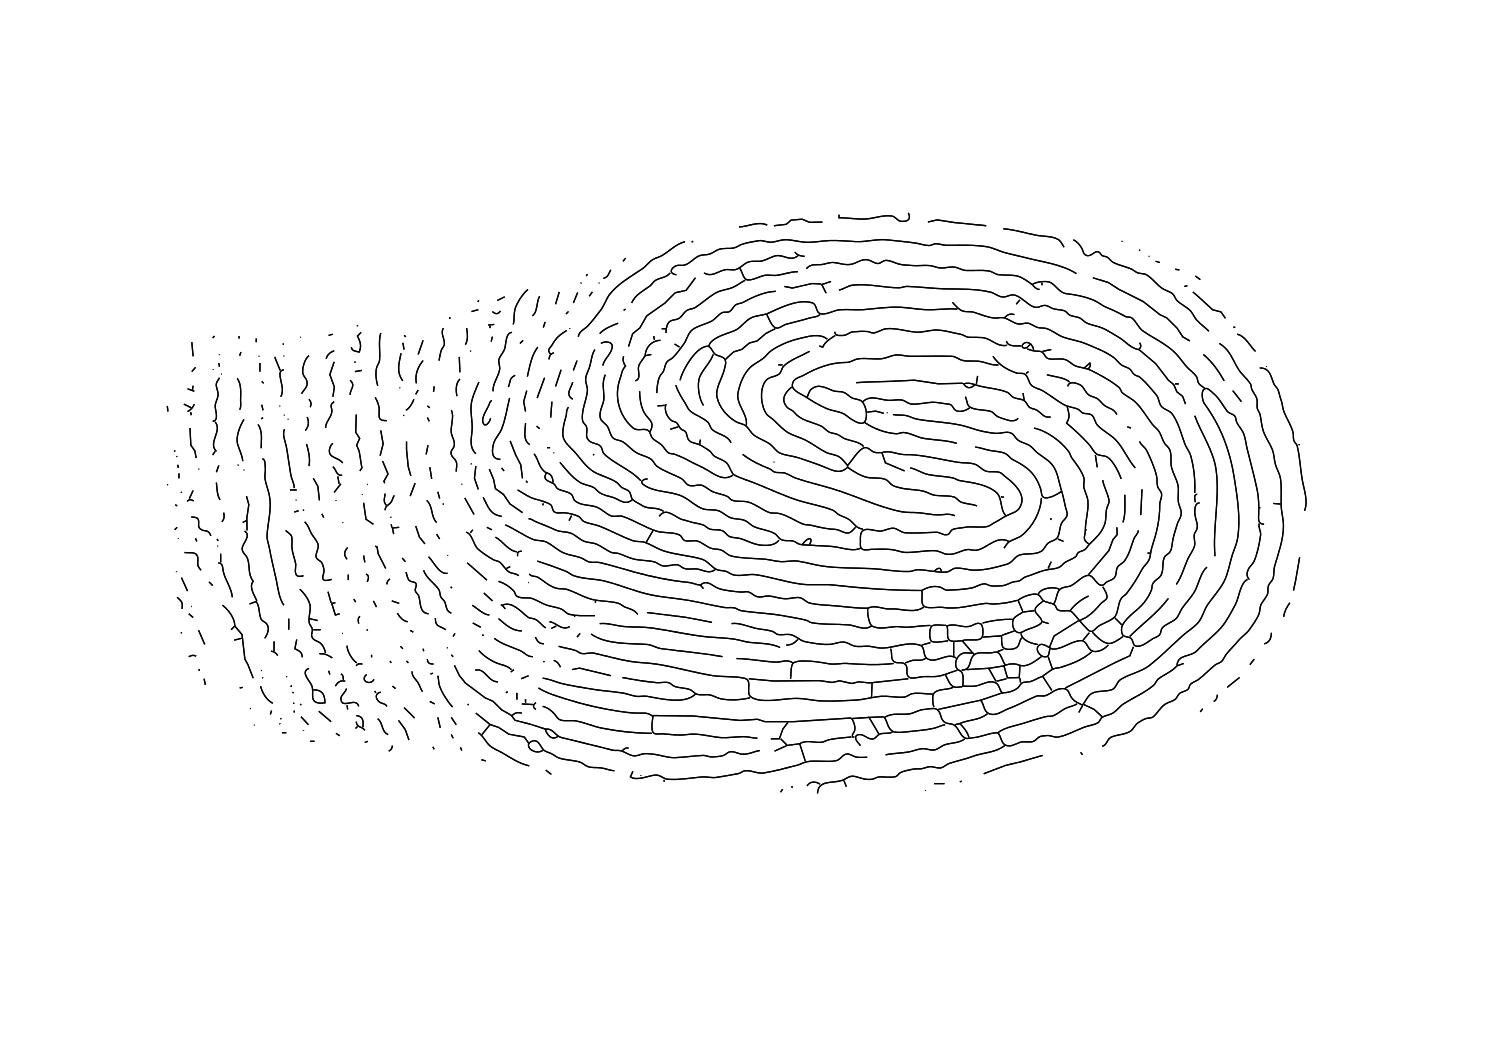 prepare-hpgl/i/fingerprint-5.png